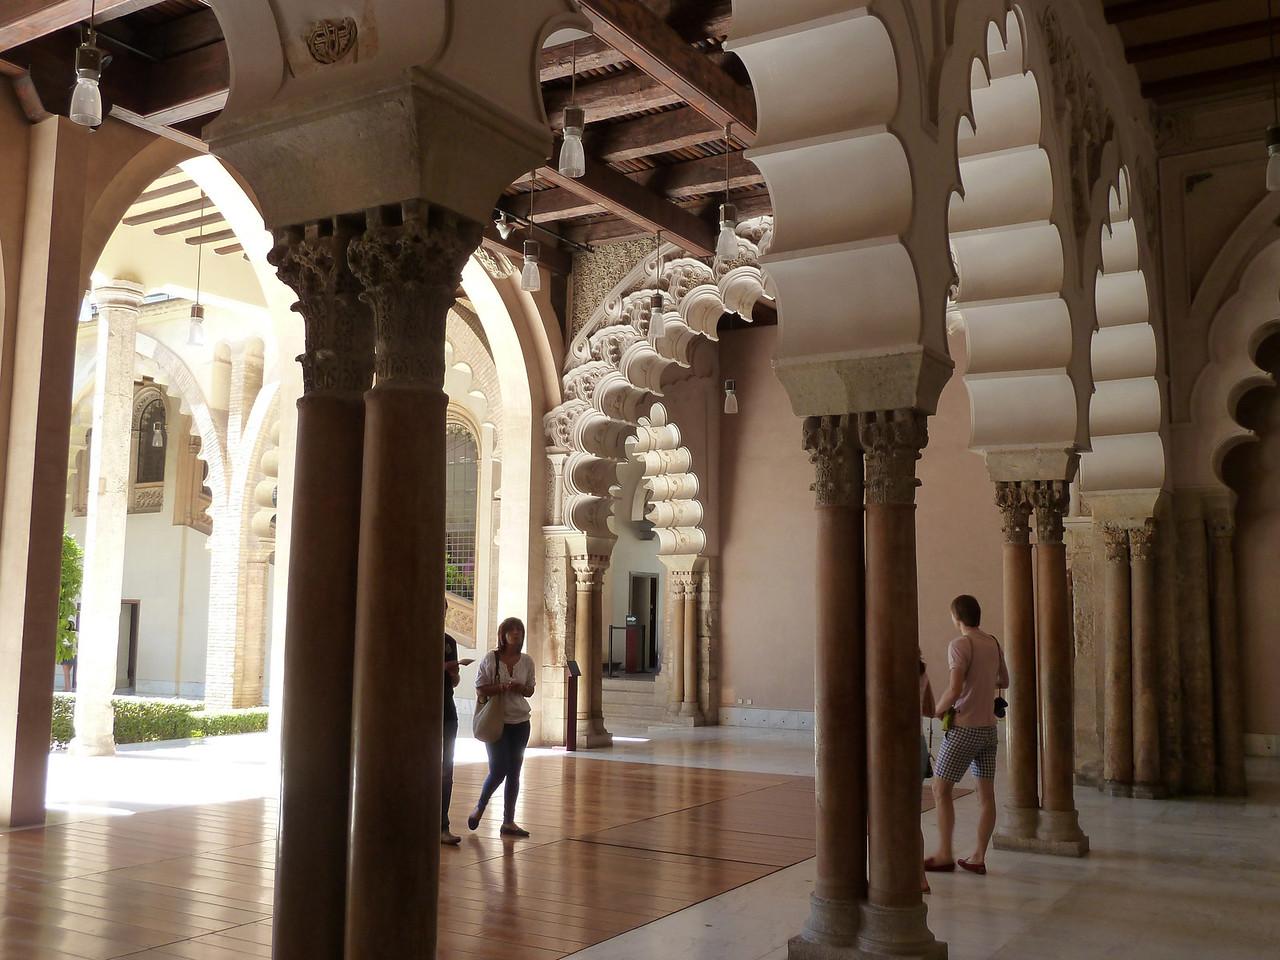 The beautiful Aljaferia Palace in Zaragoza, Spain!